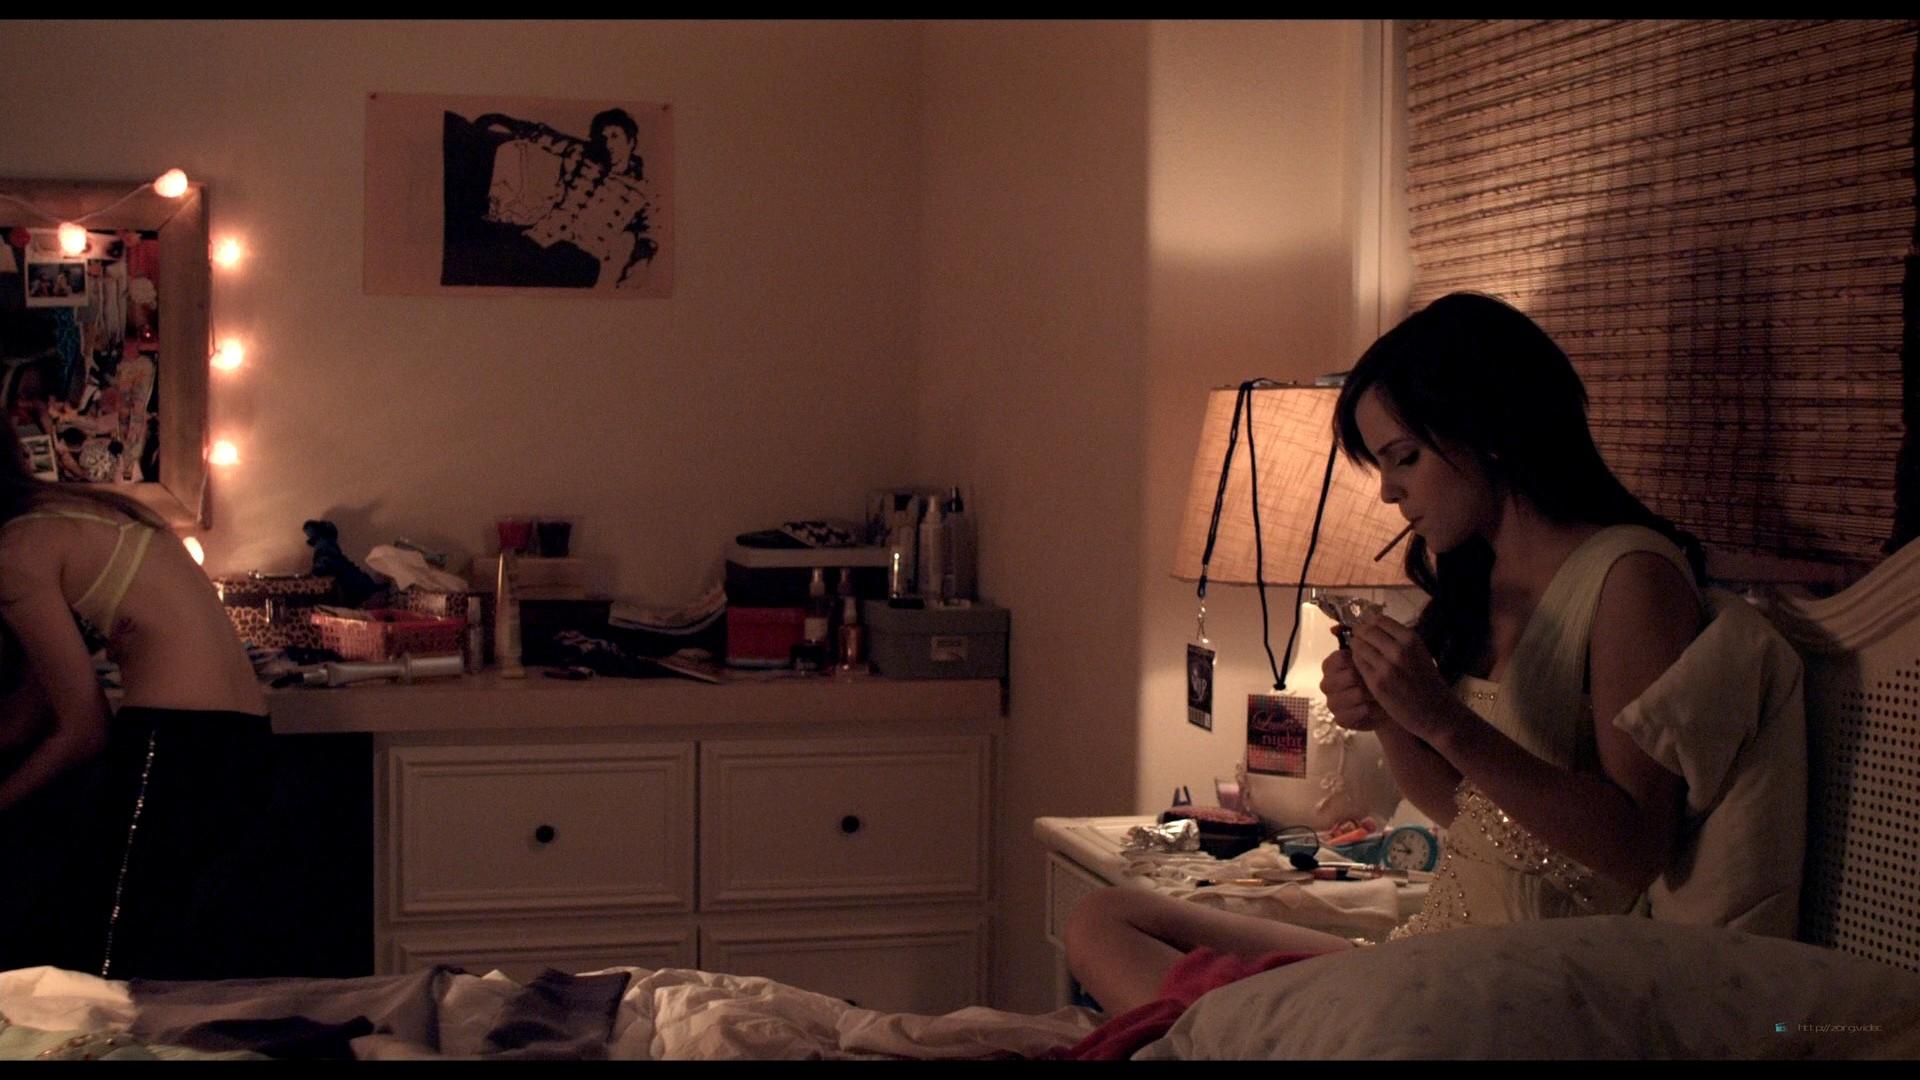 Emma Watson hot Taissa Farmiga and others sexy - The Bling Ring (2013) HD 1080p BluRay (7)